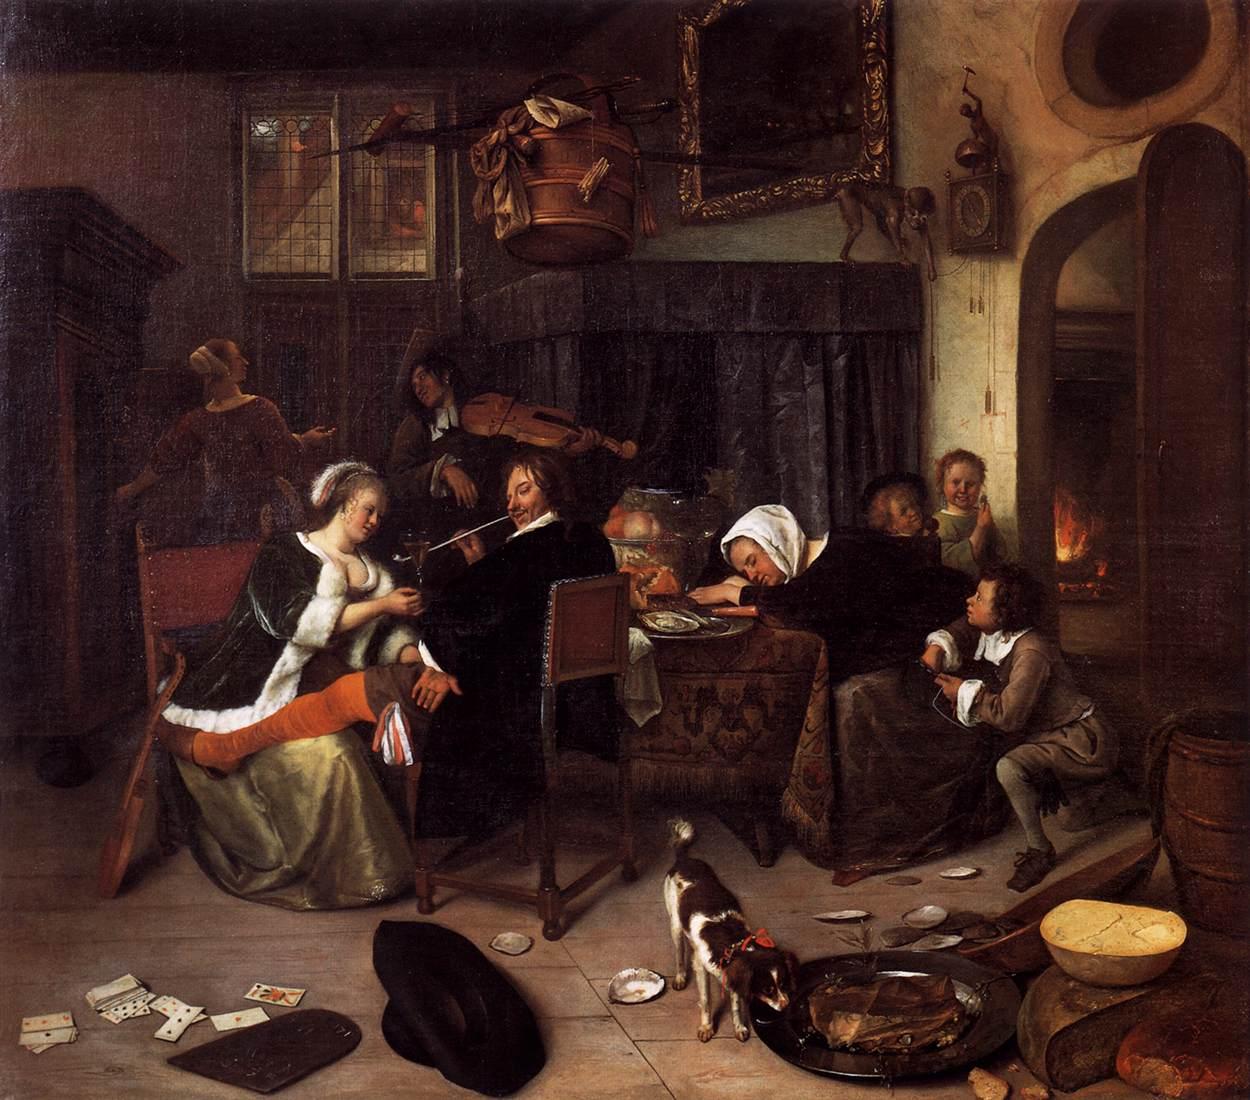 File:Steen Dissolute Household.jpg - Wikimedia Commons